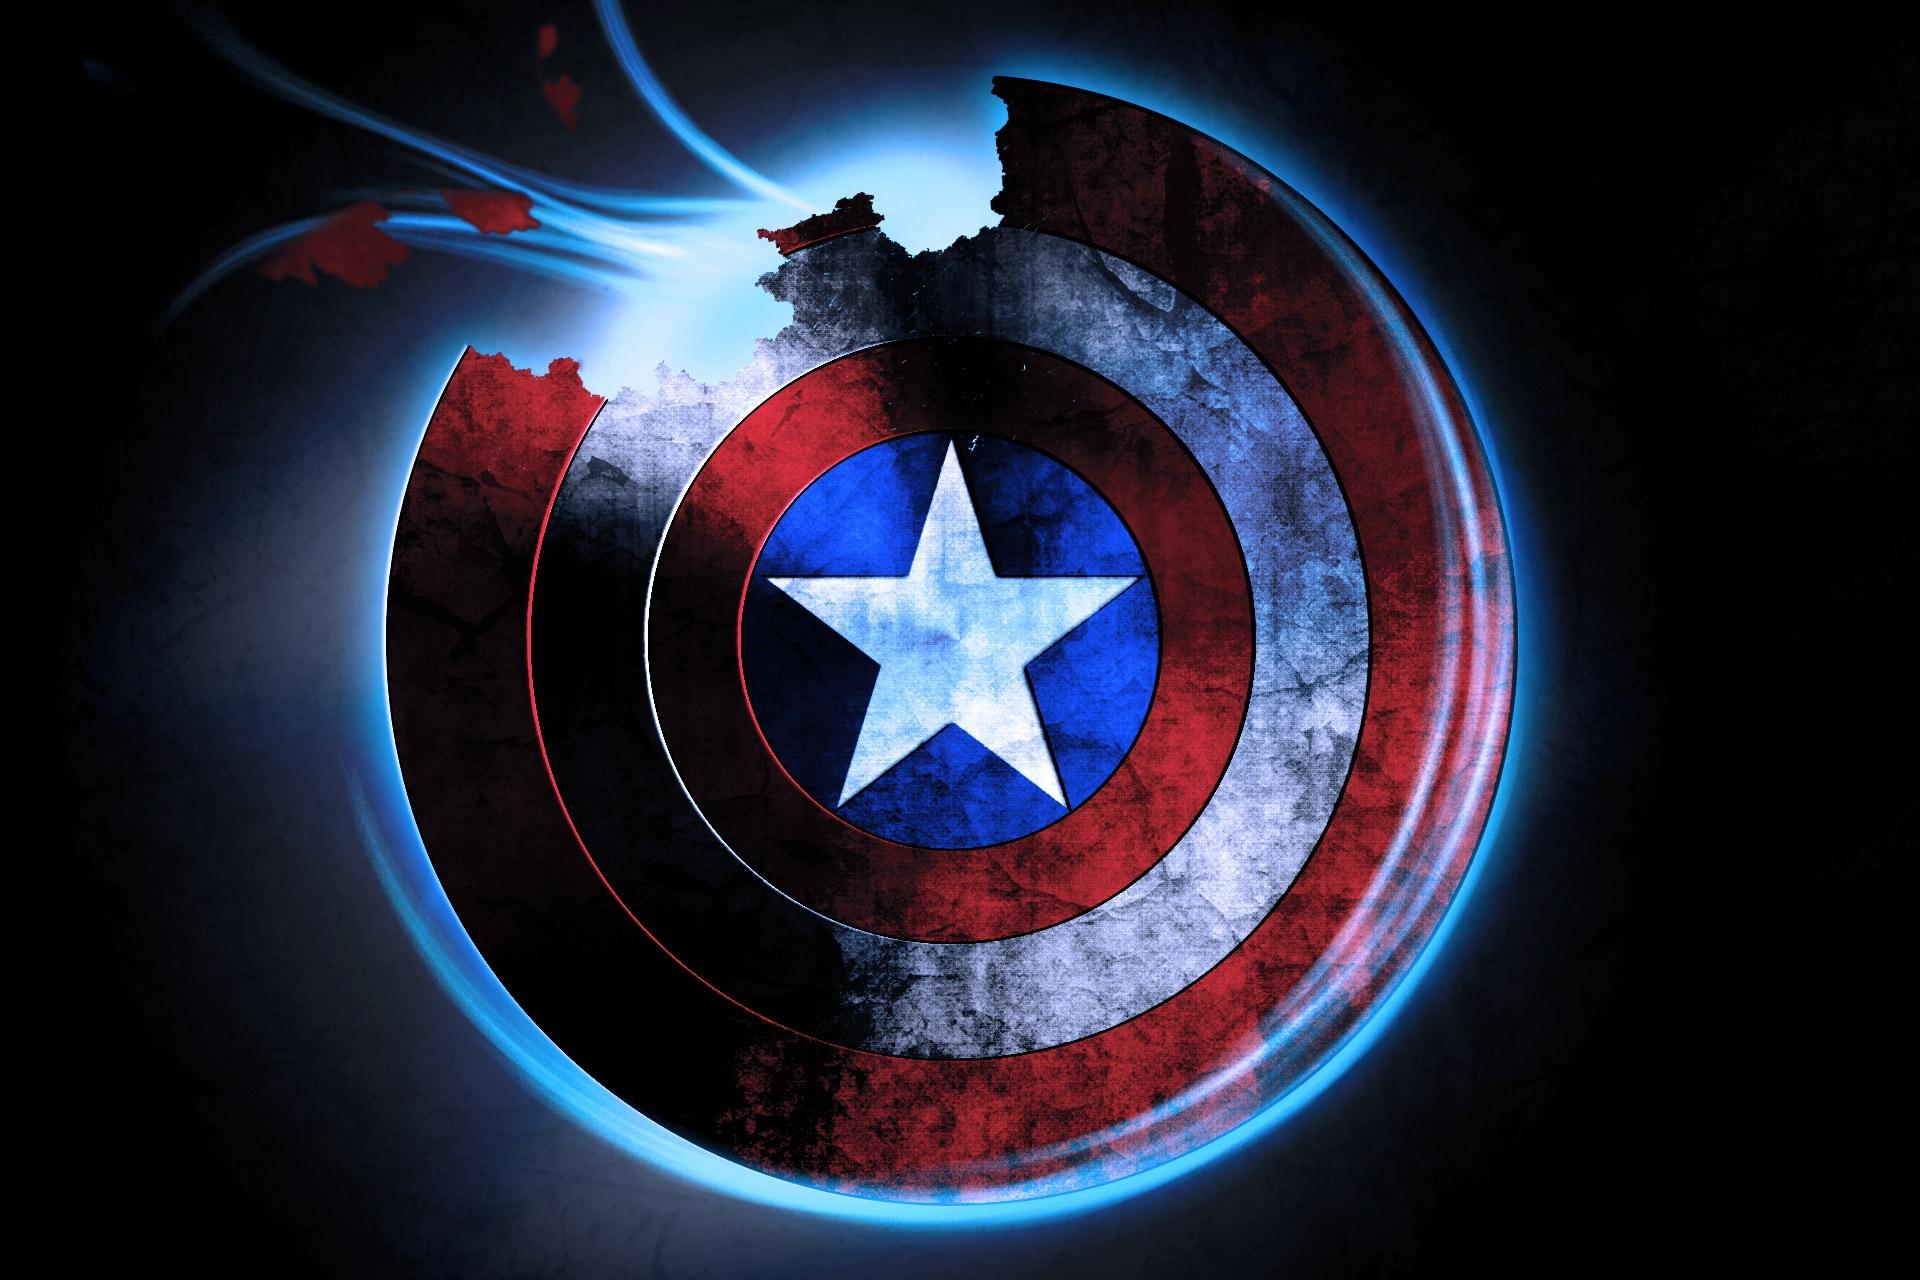 47 Captain America Shield Wallpaper Hd On Wallpapersafari